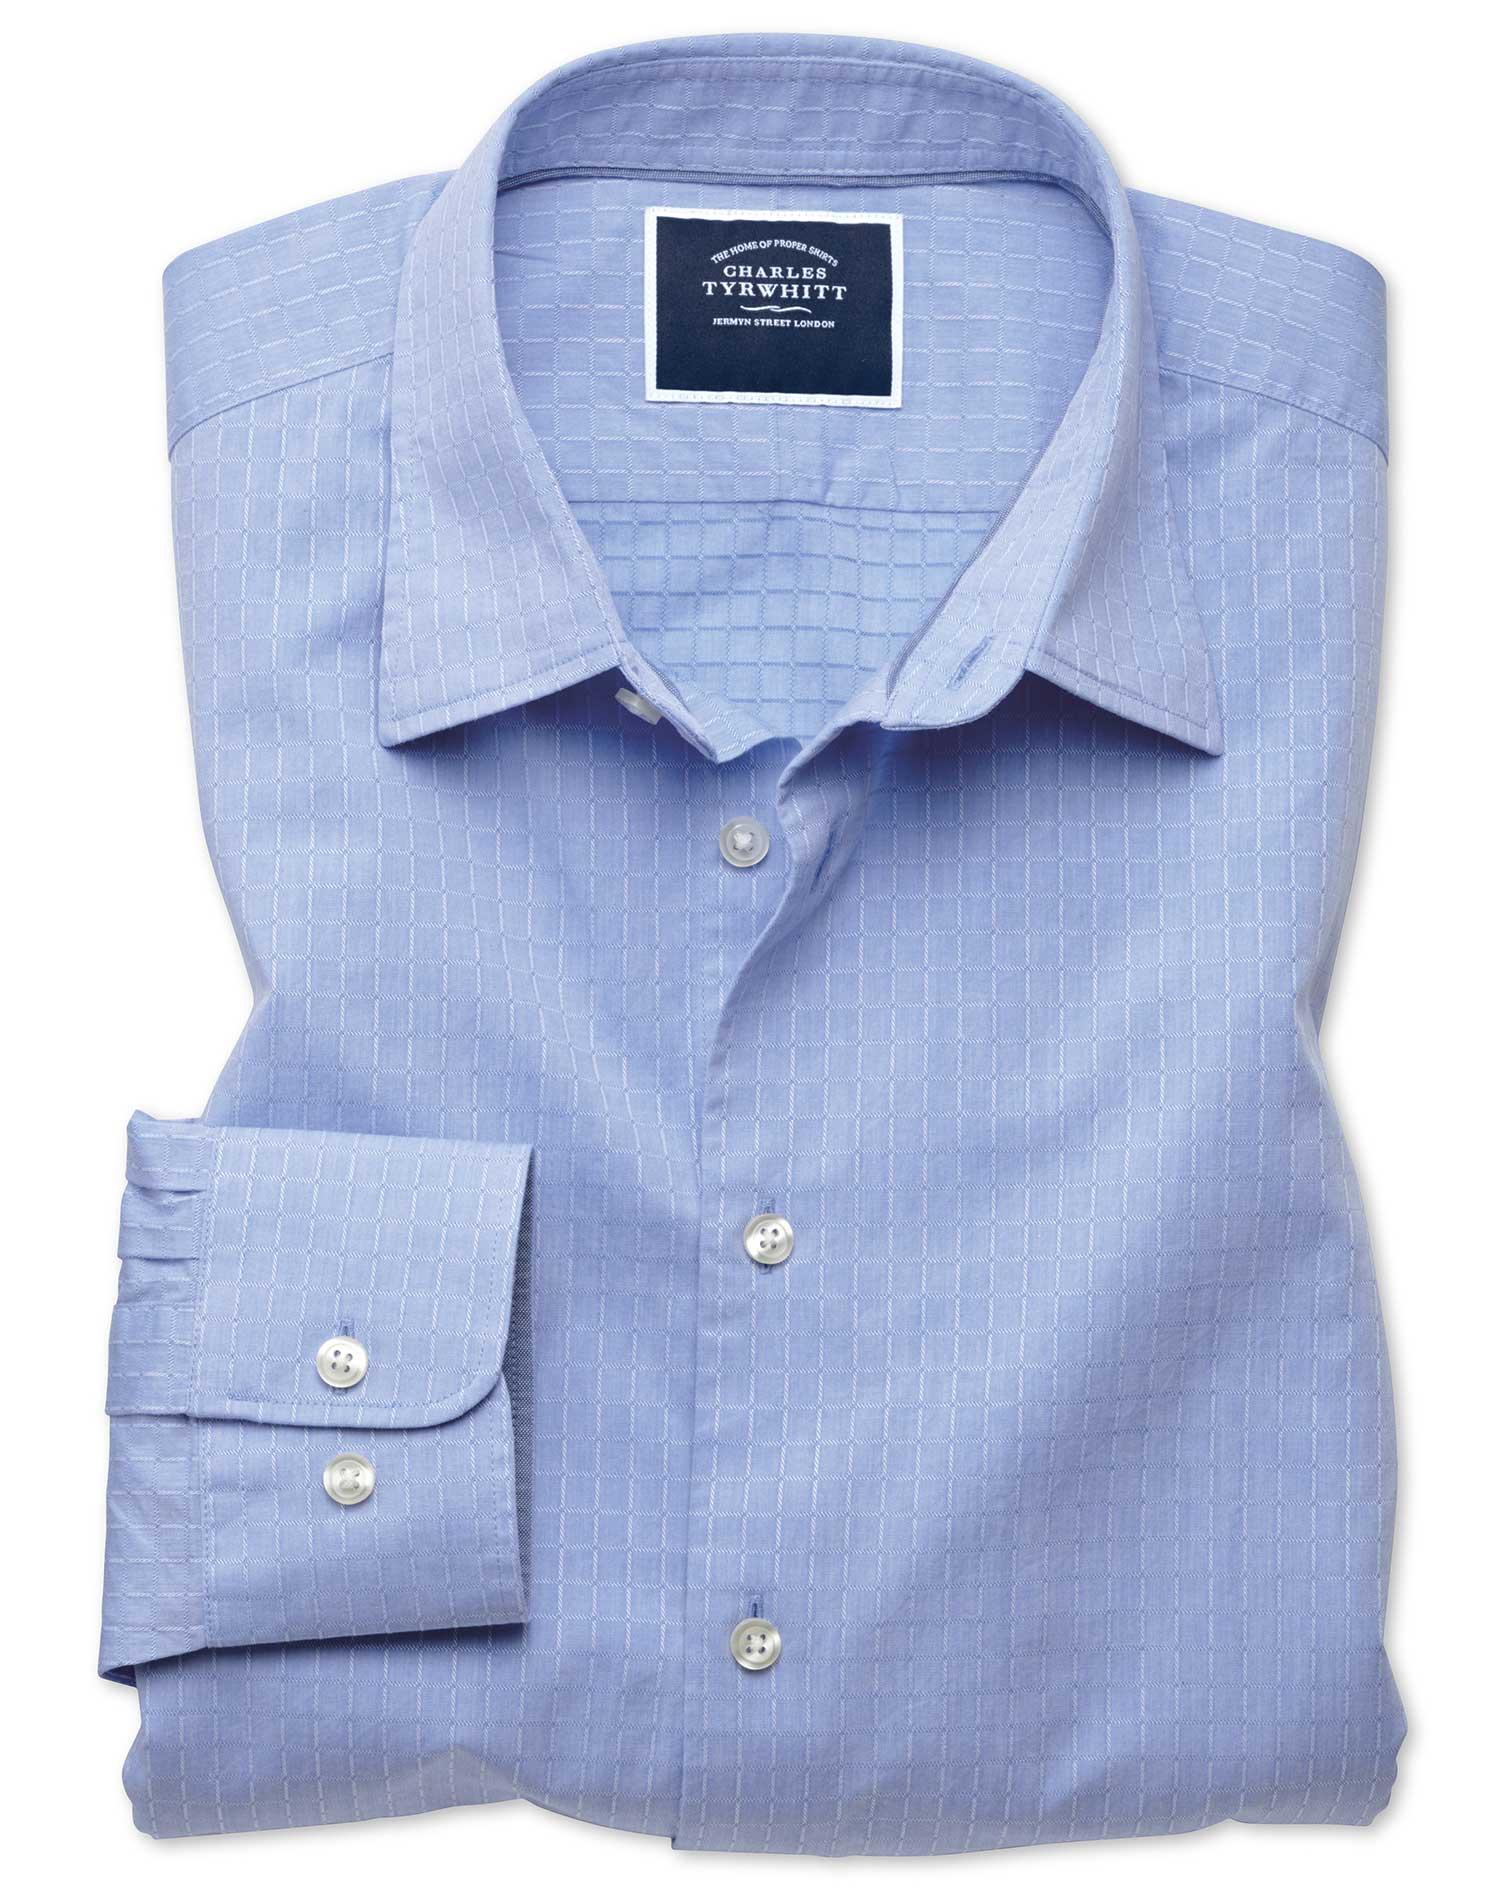 Classic Fit Blue Square Soft Texture Cotton Shirt Single Cuff Size Medium by Charles Tyrwhitt